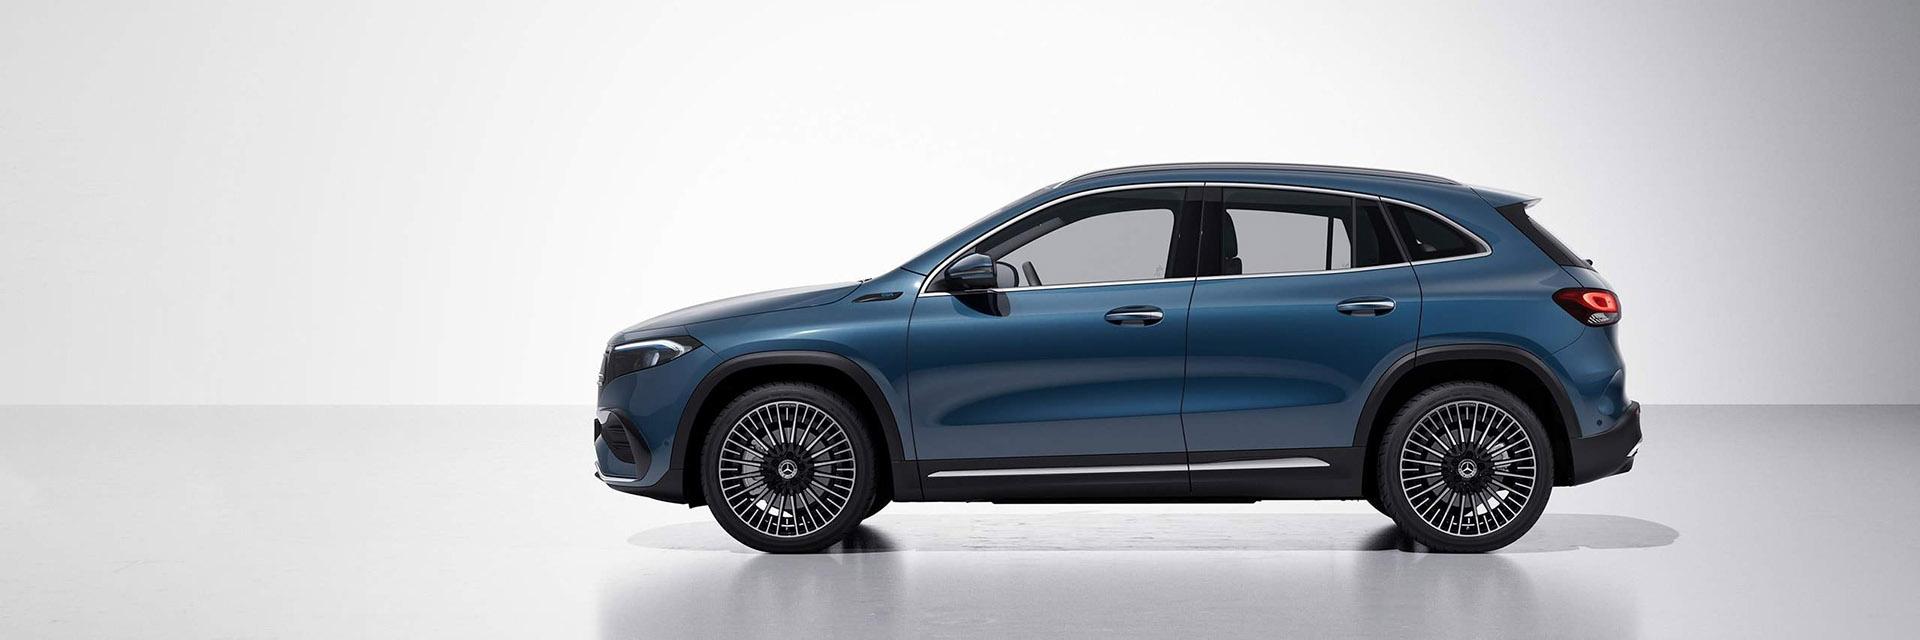 Технічні дані Mercedes-Benz EQA 2021